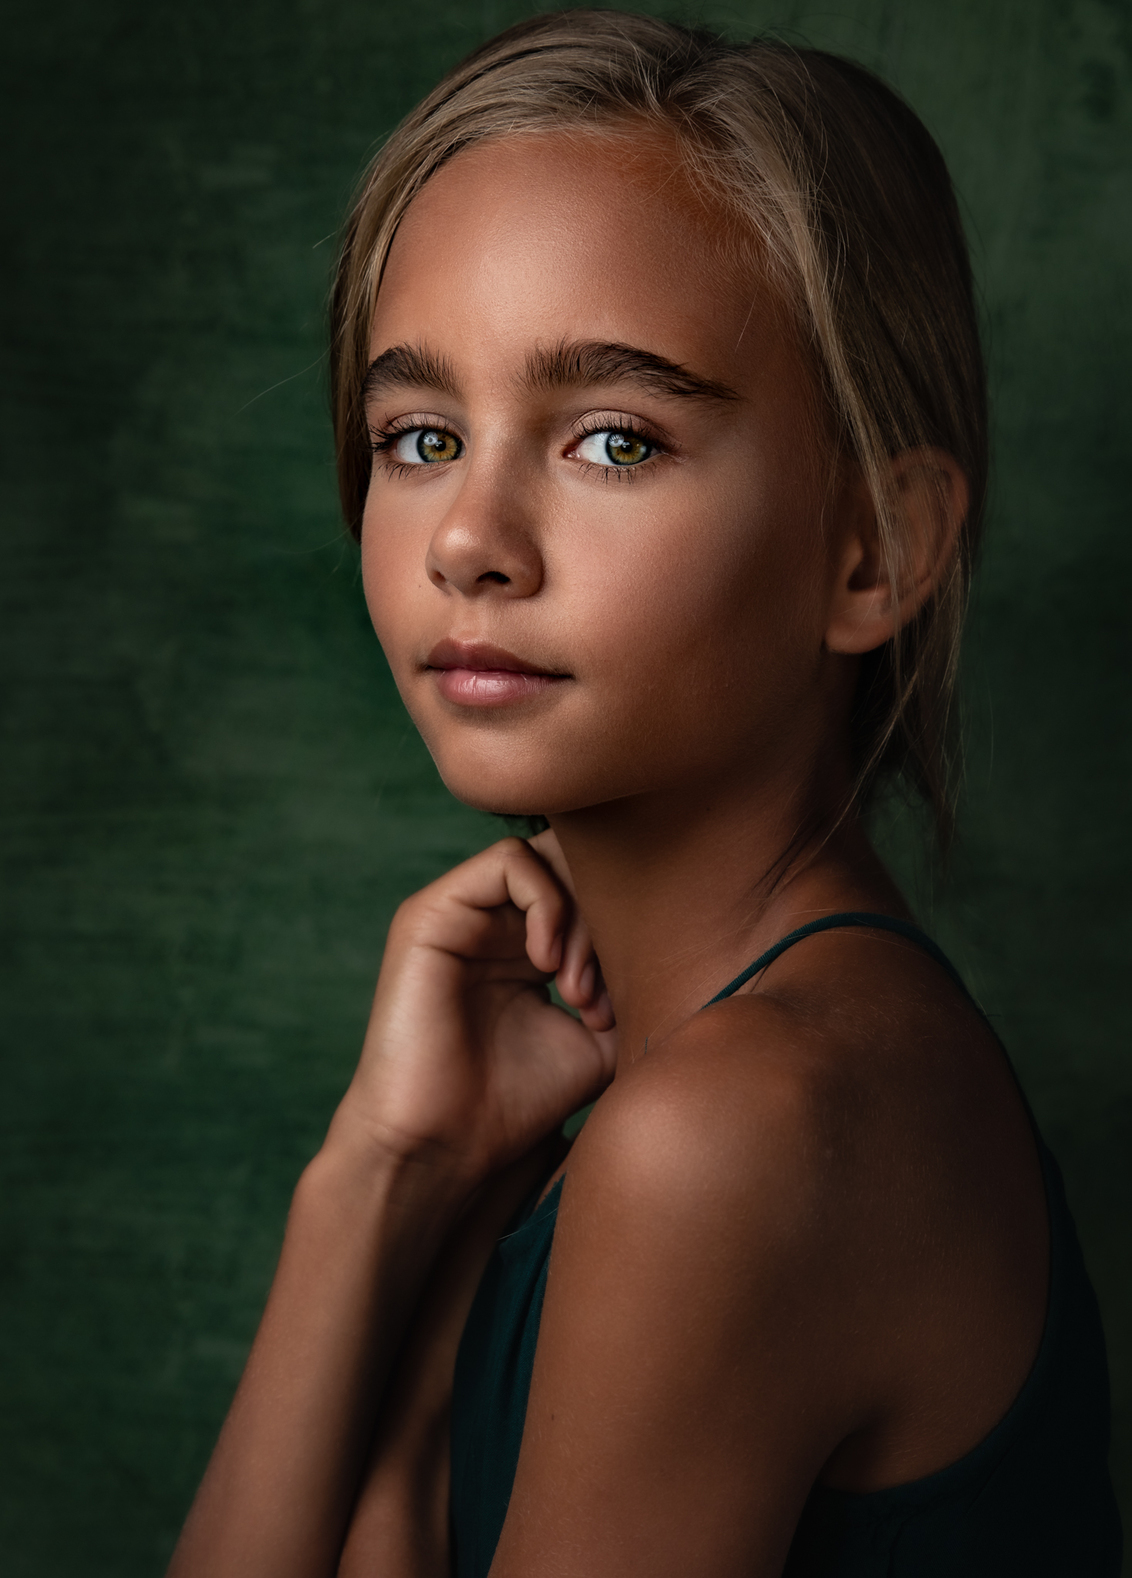 F L E U R - portret - - - foto door aniekv-fotografie op 25-02-2021 - deze foto bevat: mensen, portret, model, daglicht, flits, kind, ogen, haar, meisje, lief, beauty, emotie, closeup, fotoshoot, visagie, 50mm